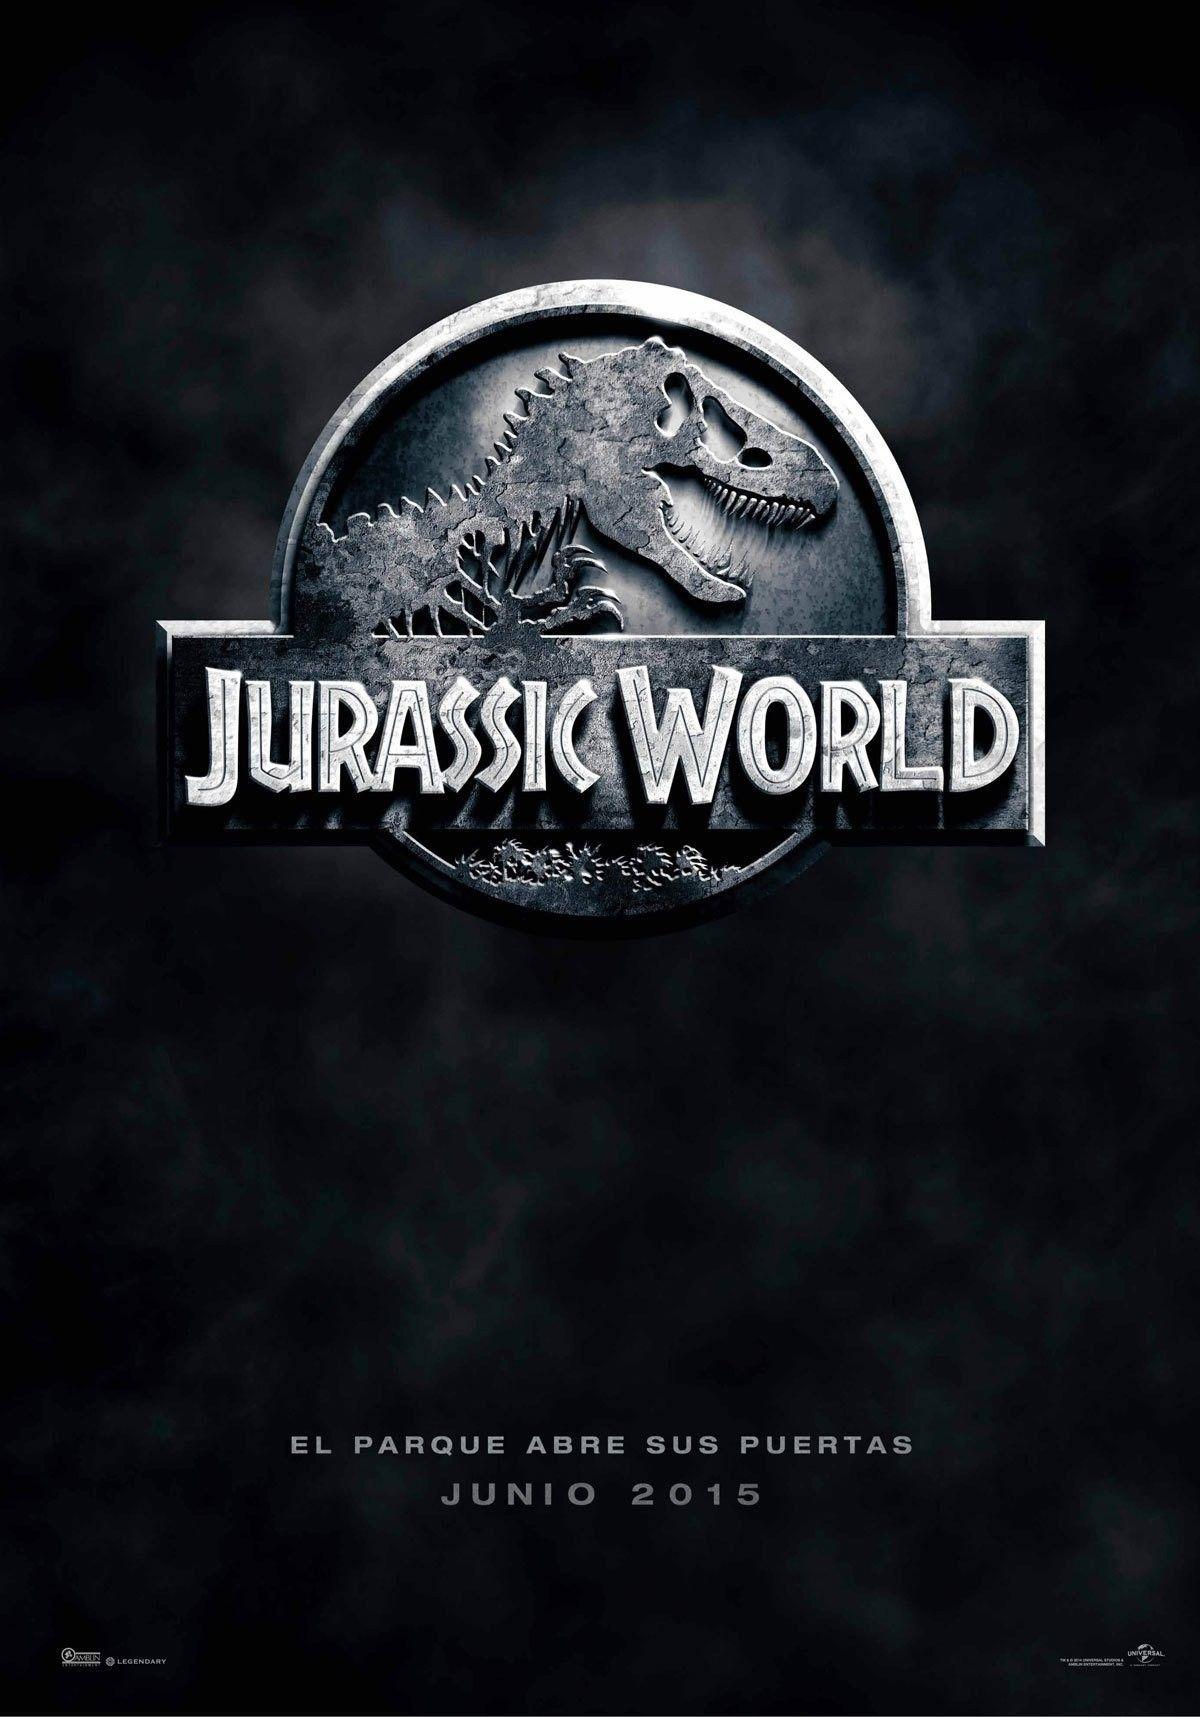 Ver Jurassic World Online Gratis 2015 Hd Pelicula Completa Espanol Jurassic World Movie Jurassic World Movie Poster New Jurassic World